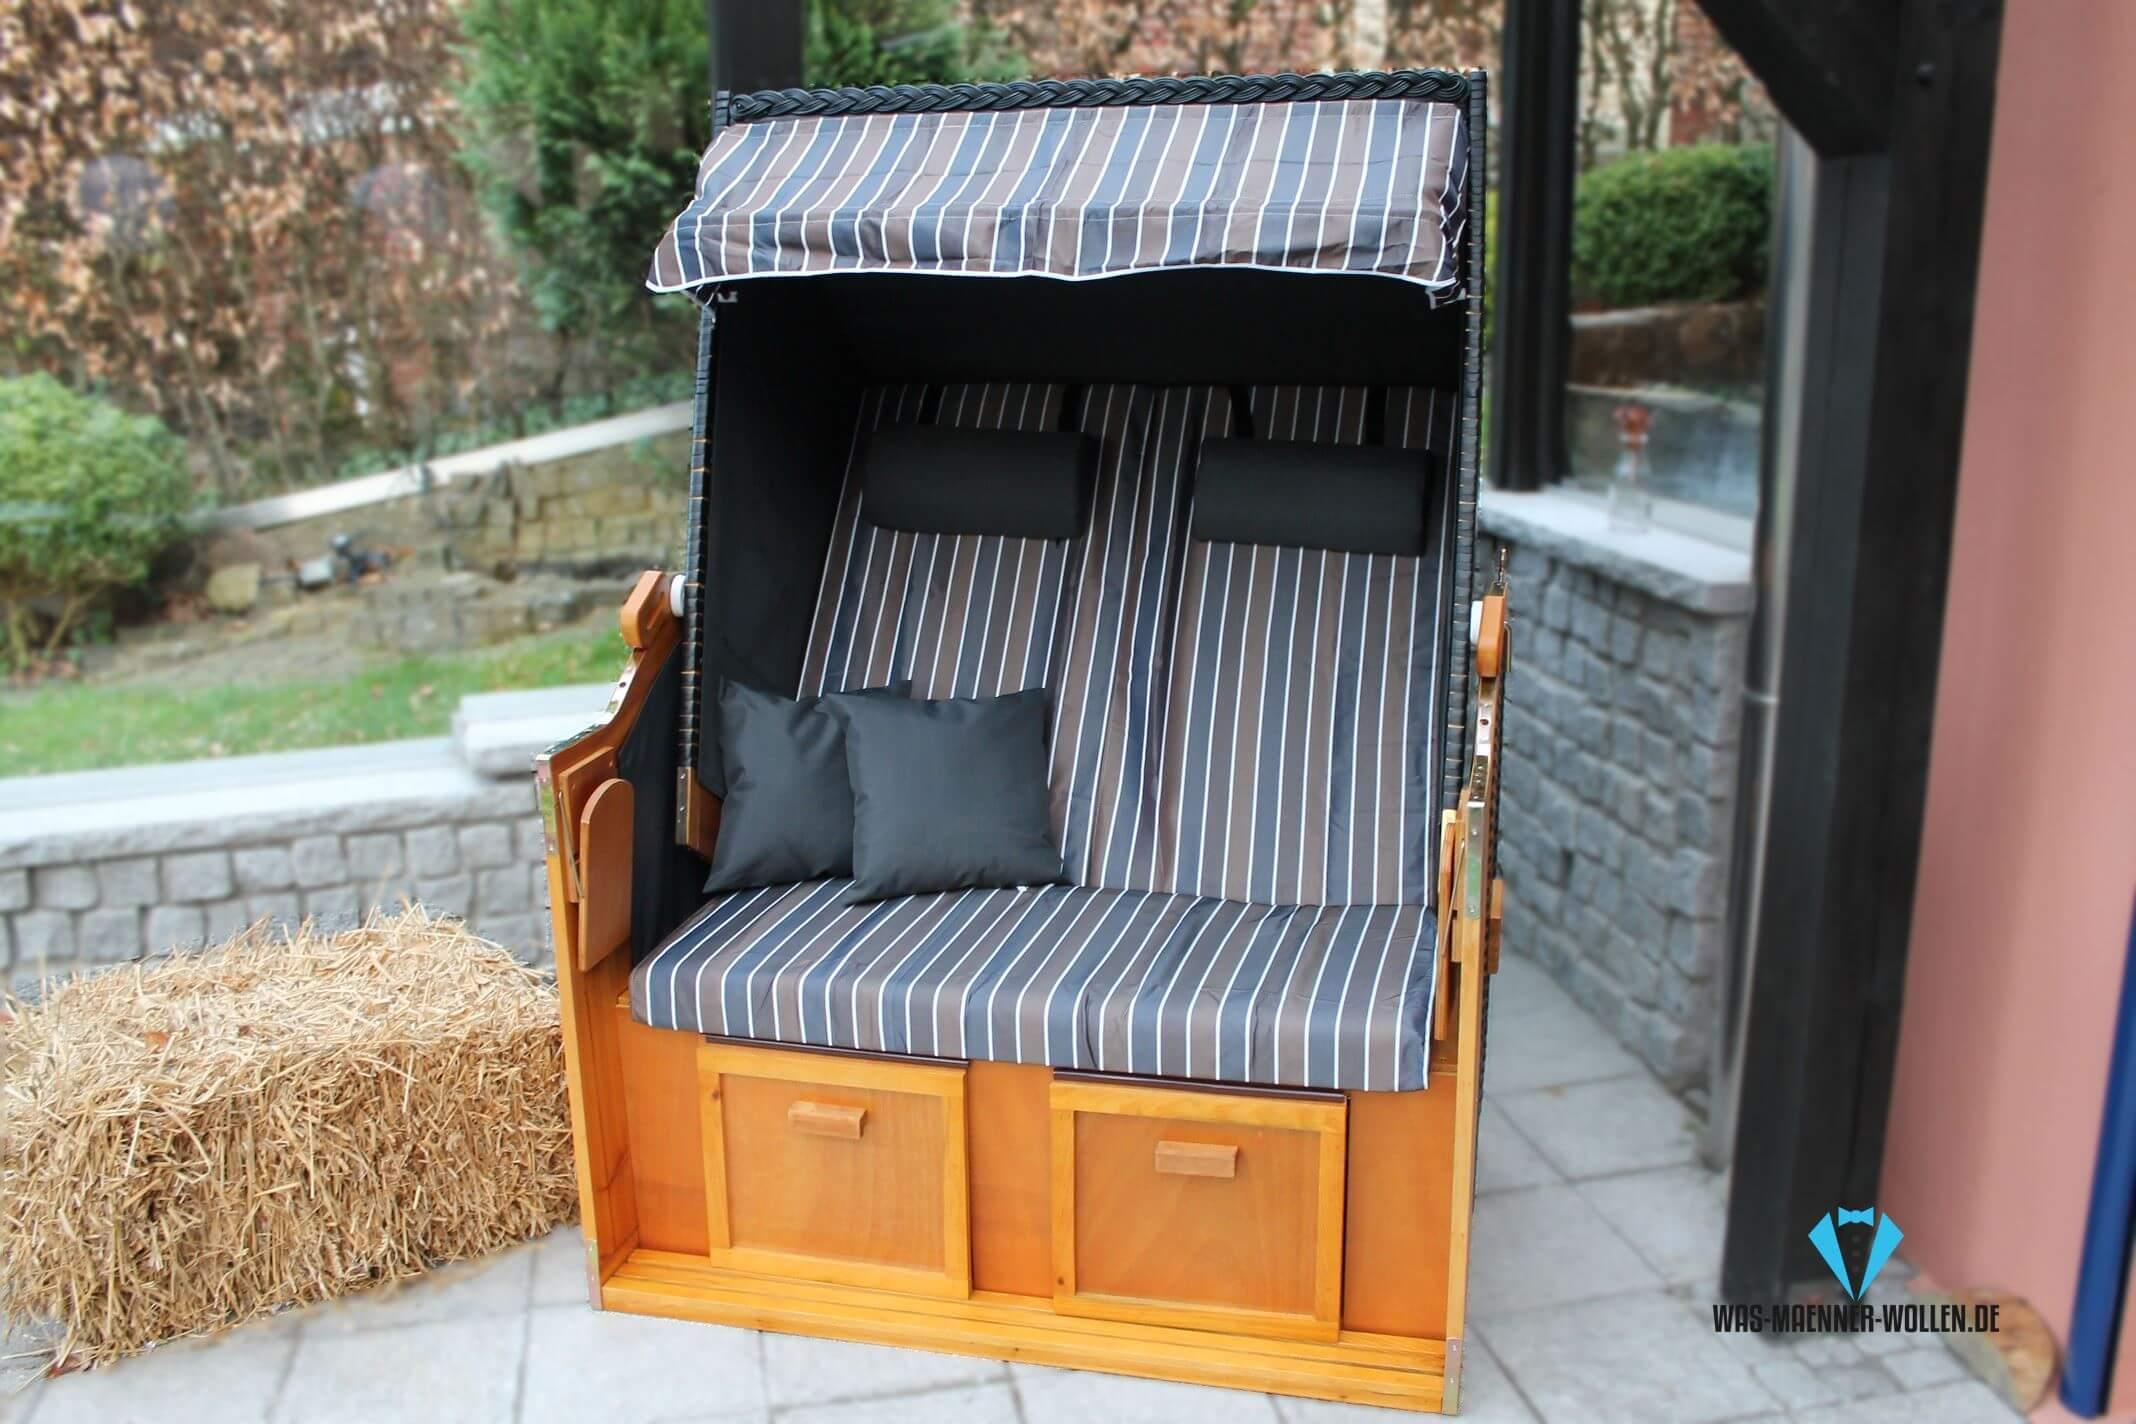 ostsee strandkorb strandfeeling zu hause genie en auf was maenner. Black Bedroom Furniture Sets. Home Design Ideas